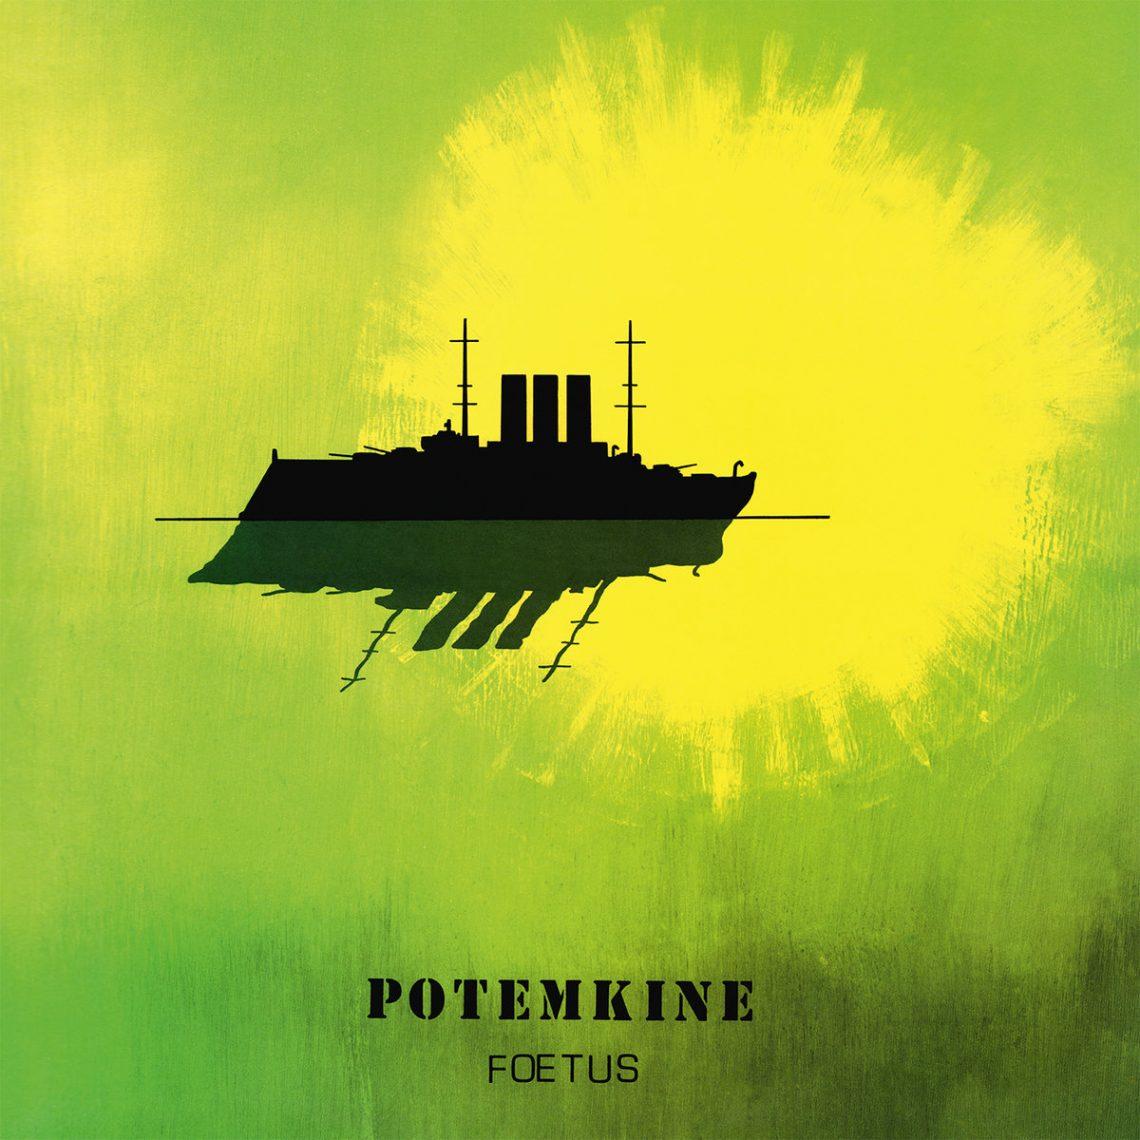 Album du jour : Foetus de Potemkine